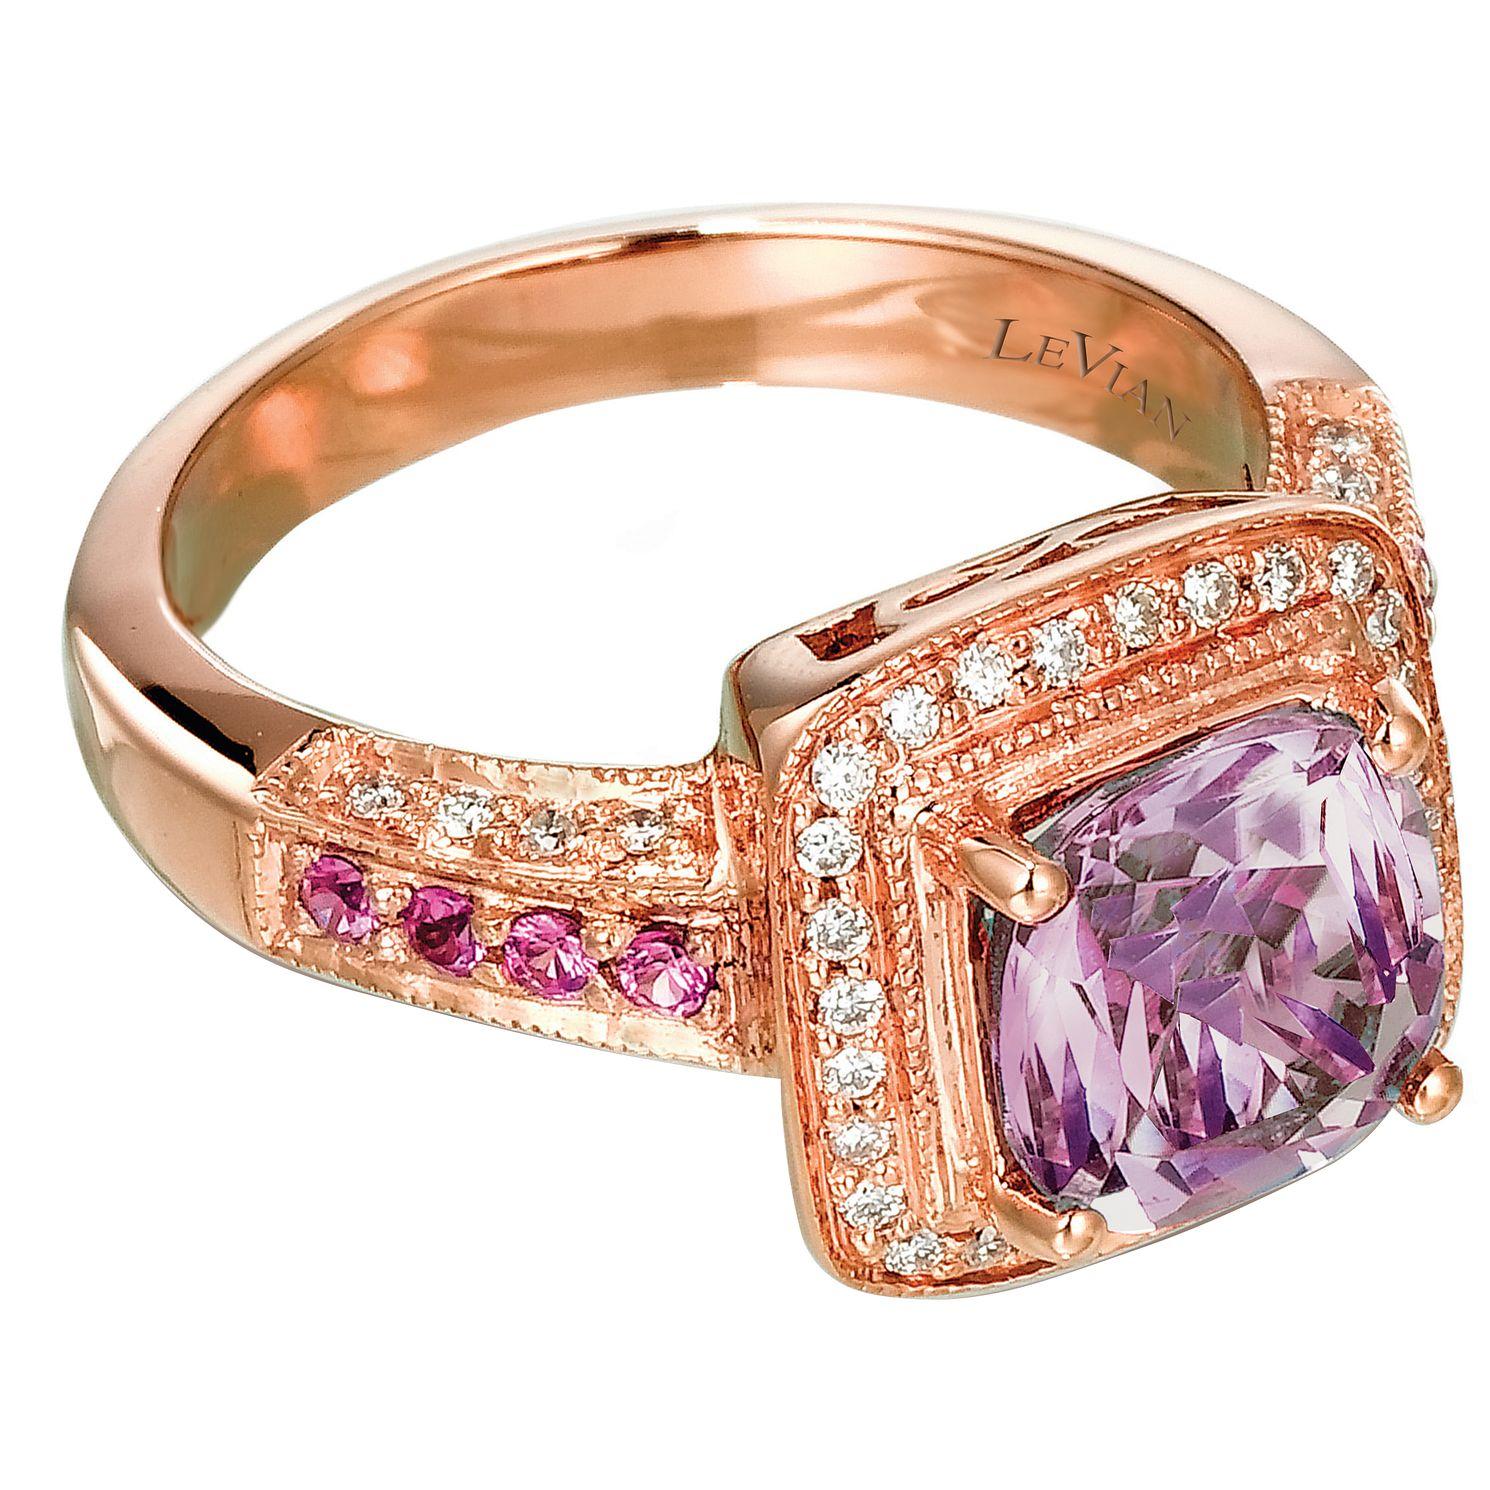 Amethyst Jewellery Product